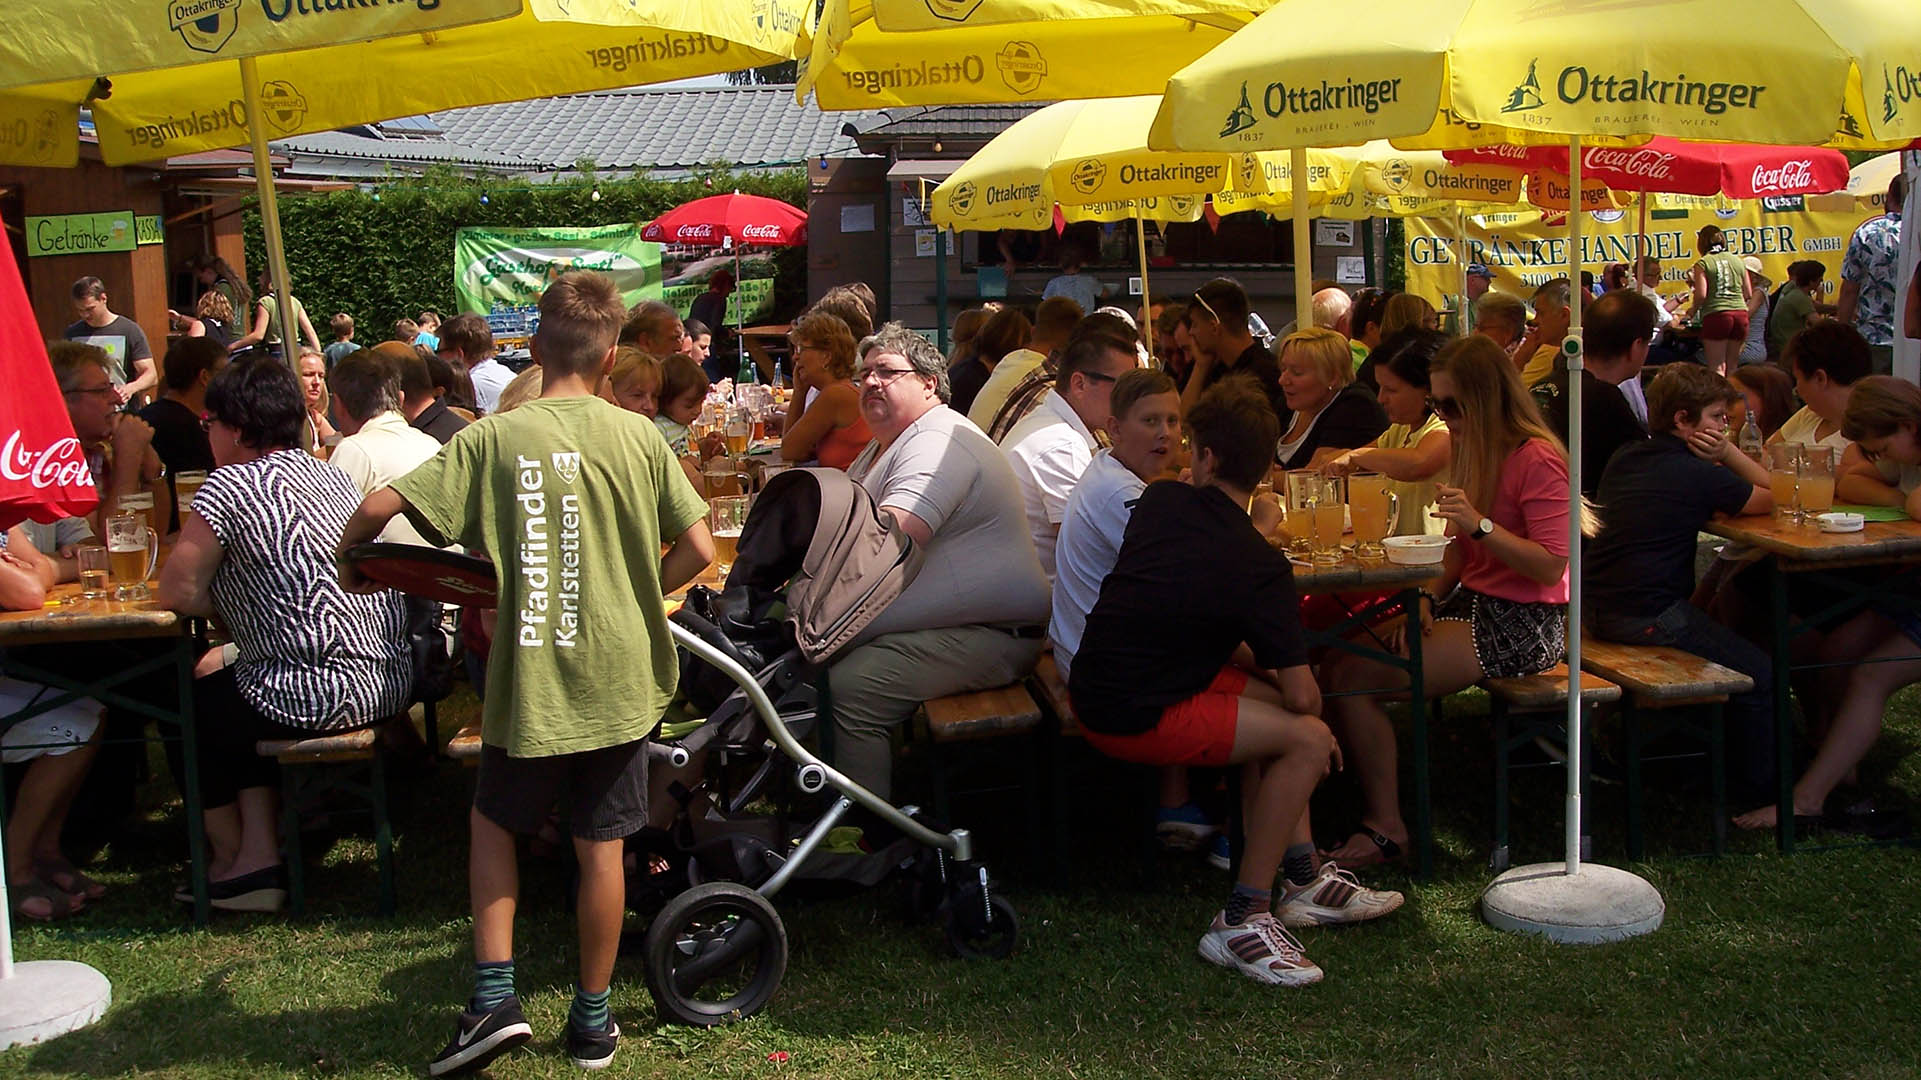 Wiesenfest - Festbetrieb